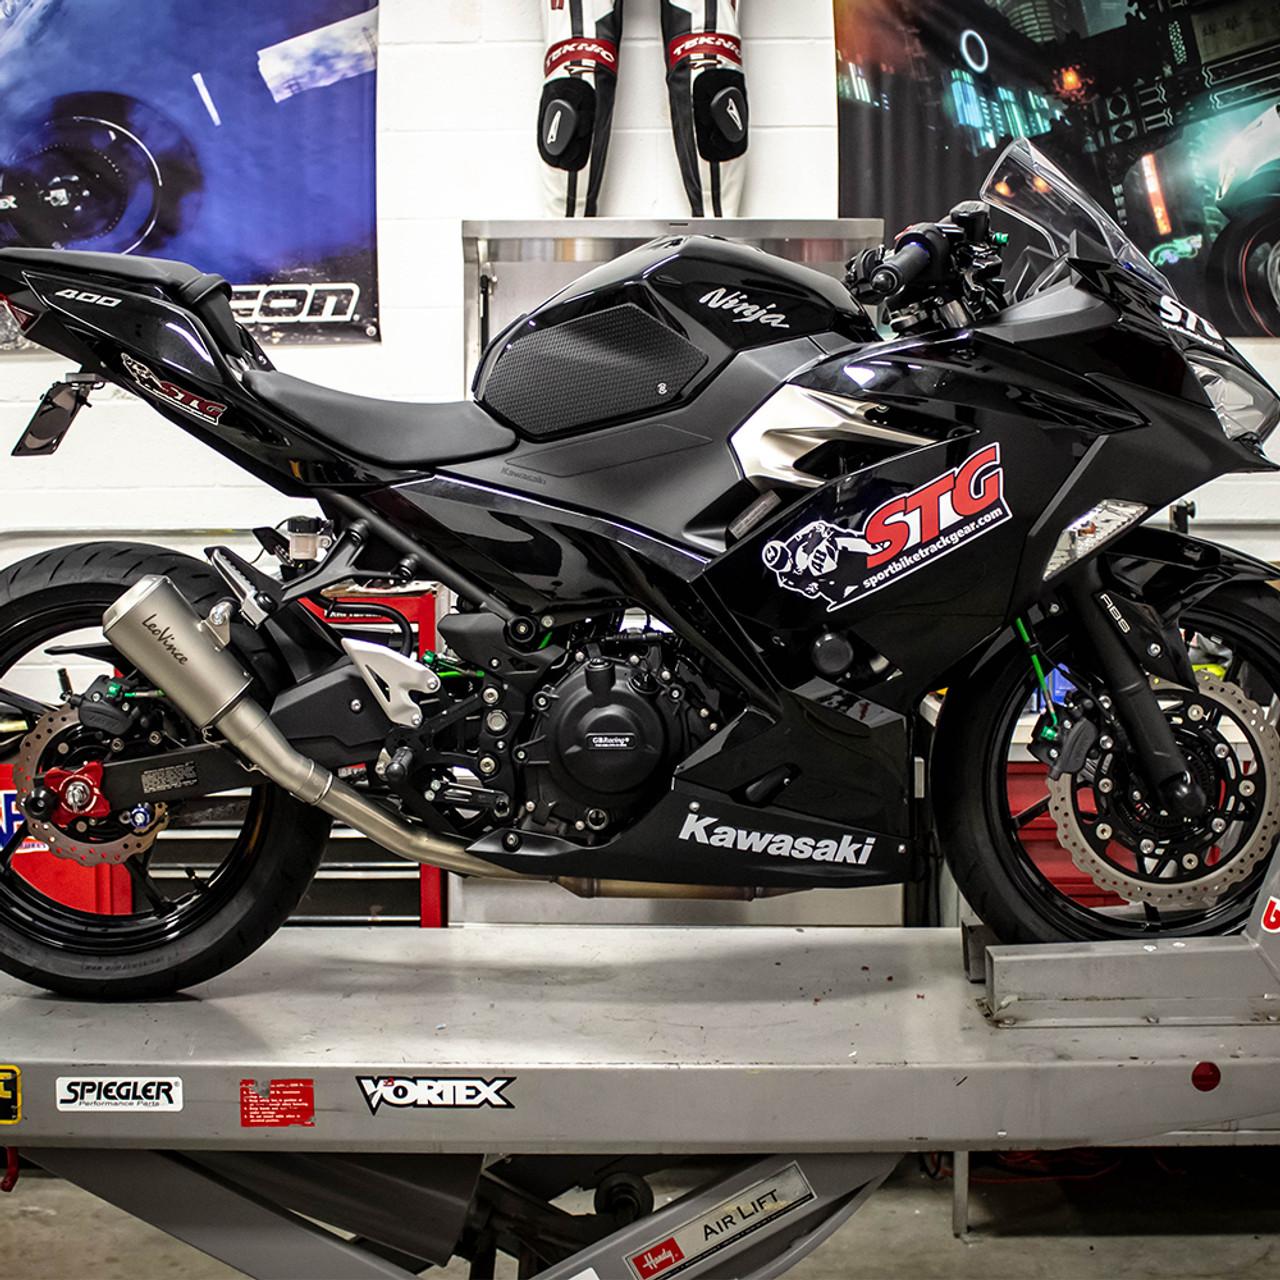 Leo Vince Kawasaki Ninja 400 2018 Lv 10 Slip On Exhaust Stainless